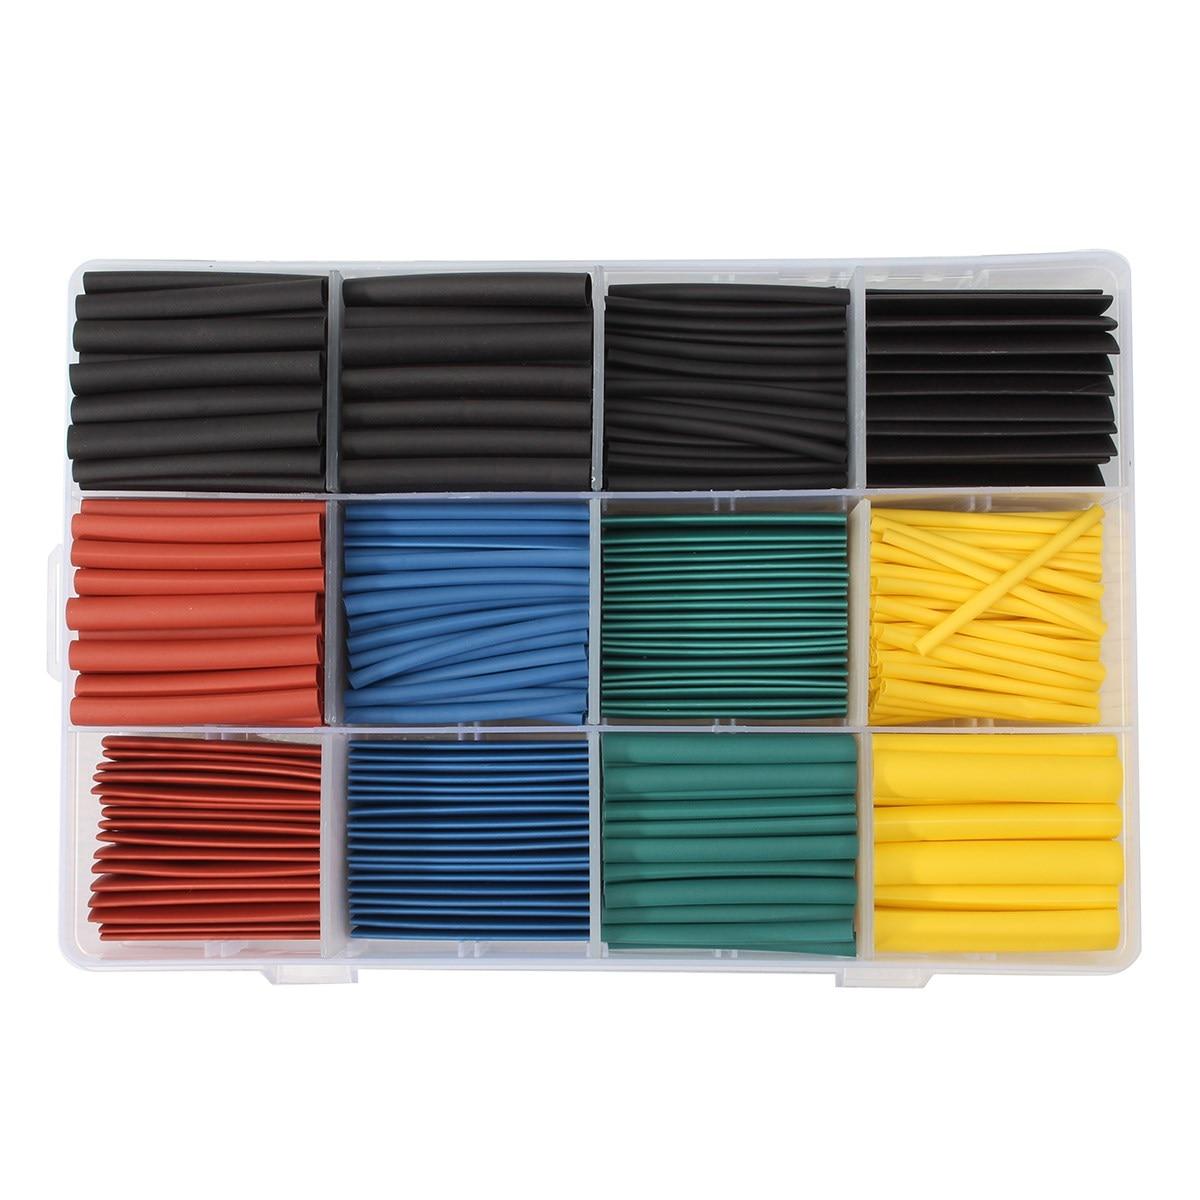 New 530pcs Multi Color Heat Shrink Tubing Insulation Shrinka